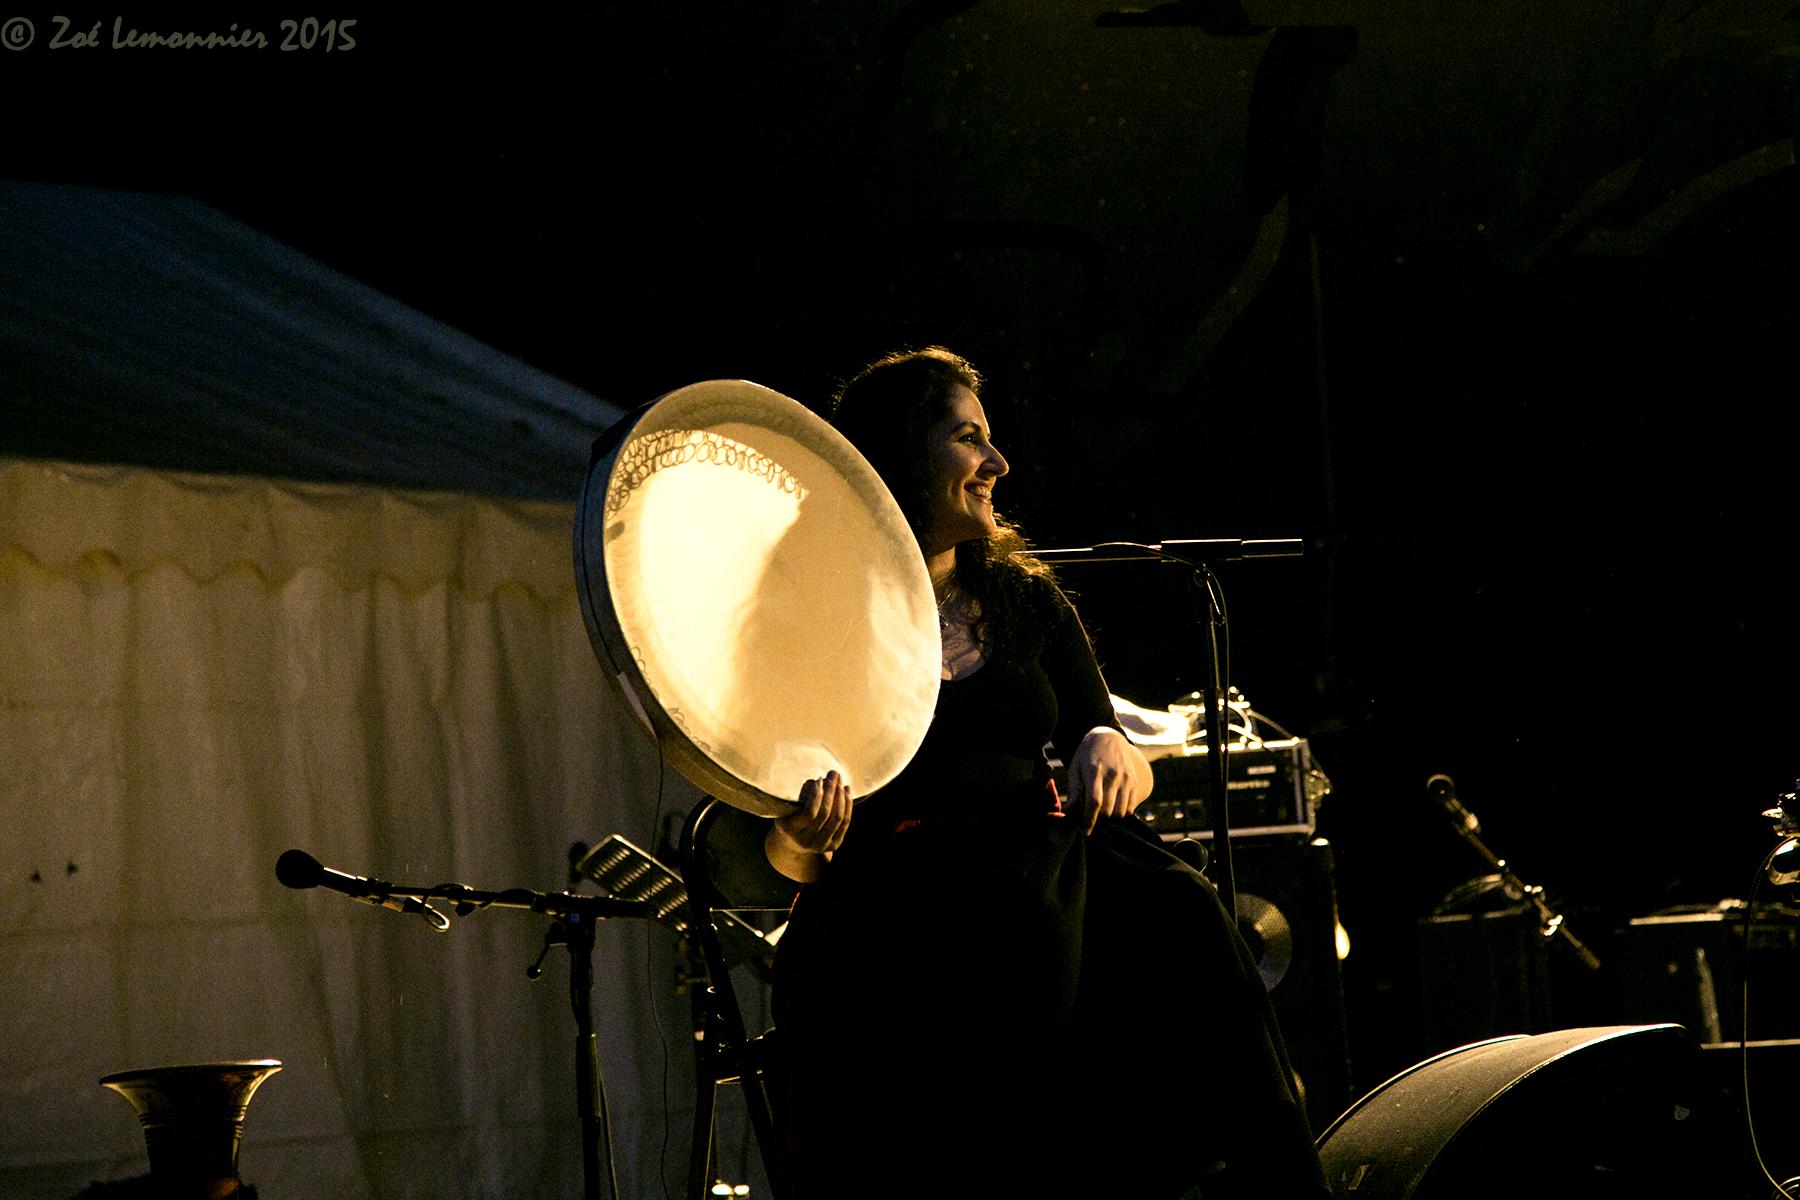 Shadi Fathi musicienne iranienne